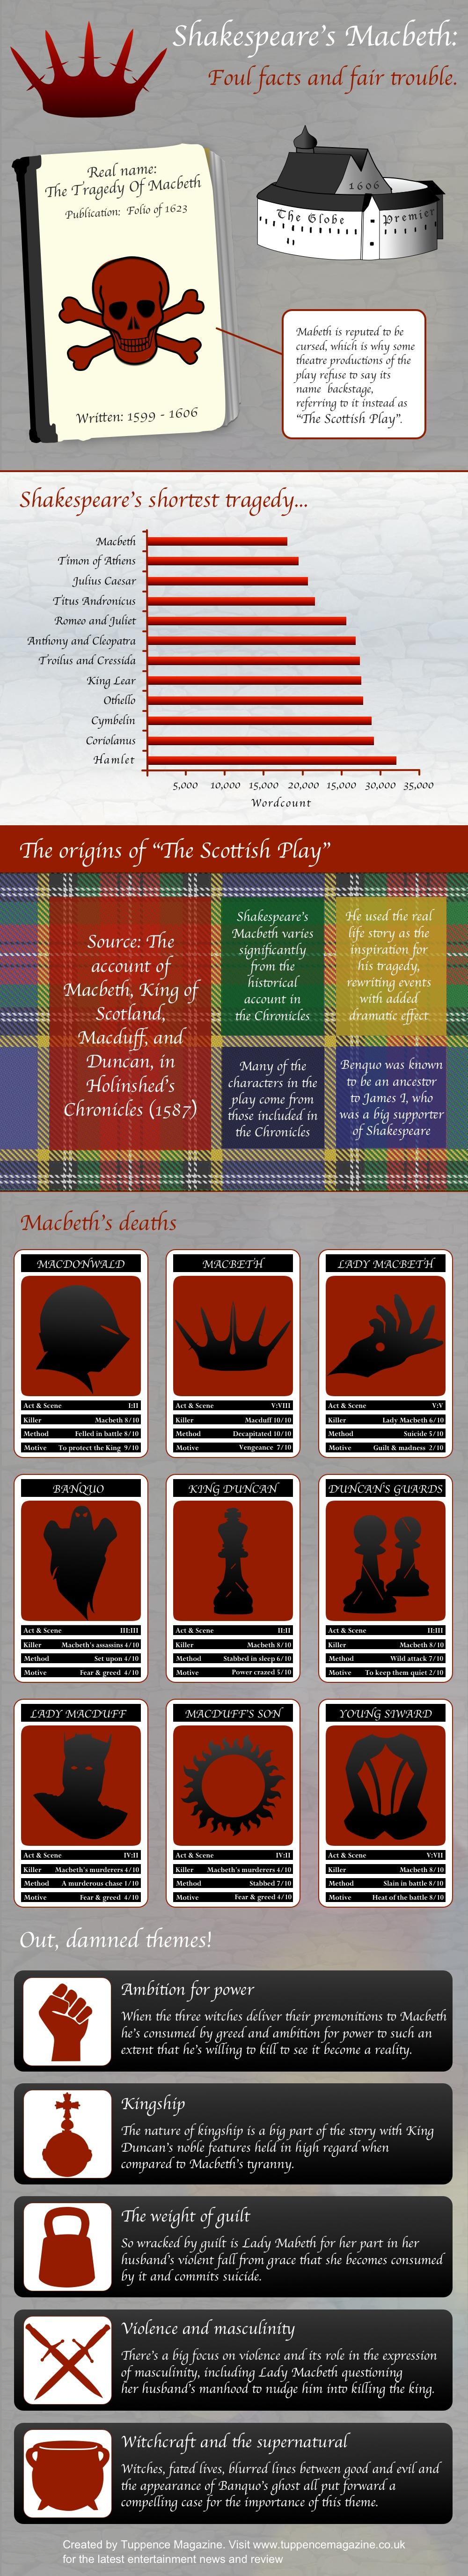 Macbeth Play Overview Resource Shakespeare Lesson Teaching Literature Juliu Caesar Act 2 Scene 1 Explanation Modern Translation One Summary